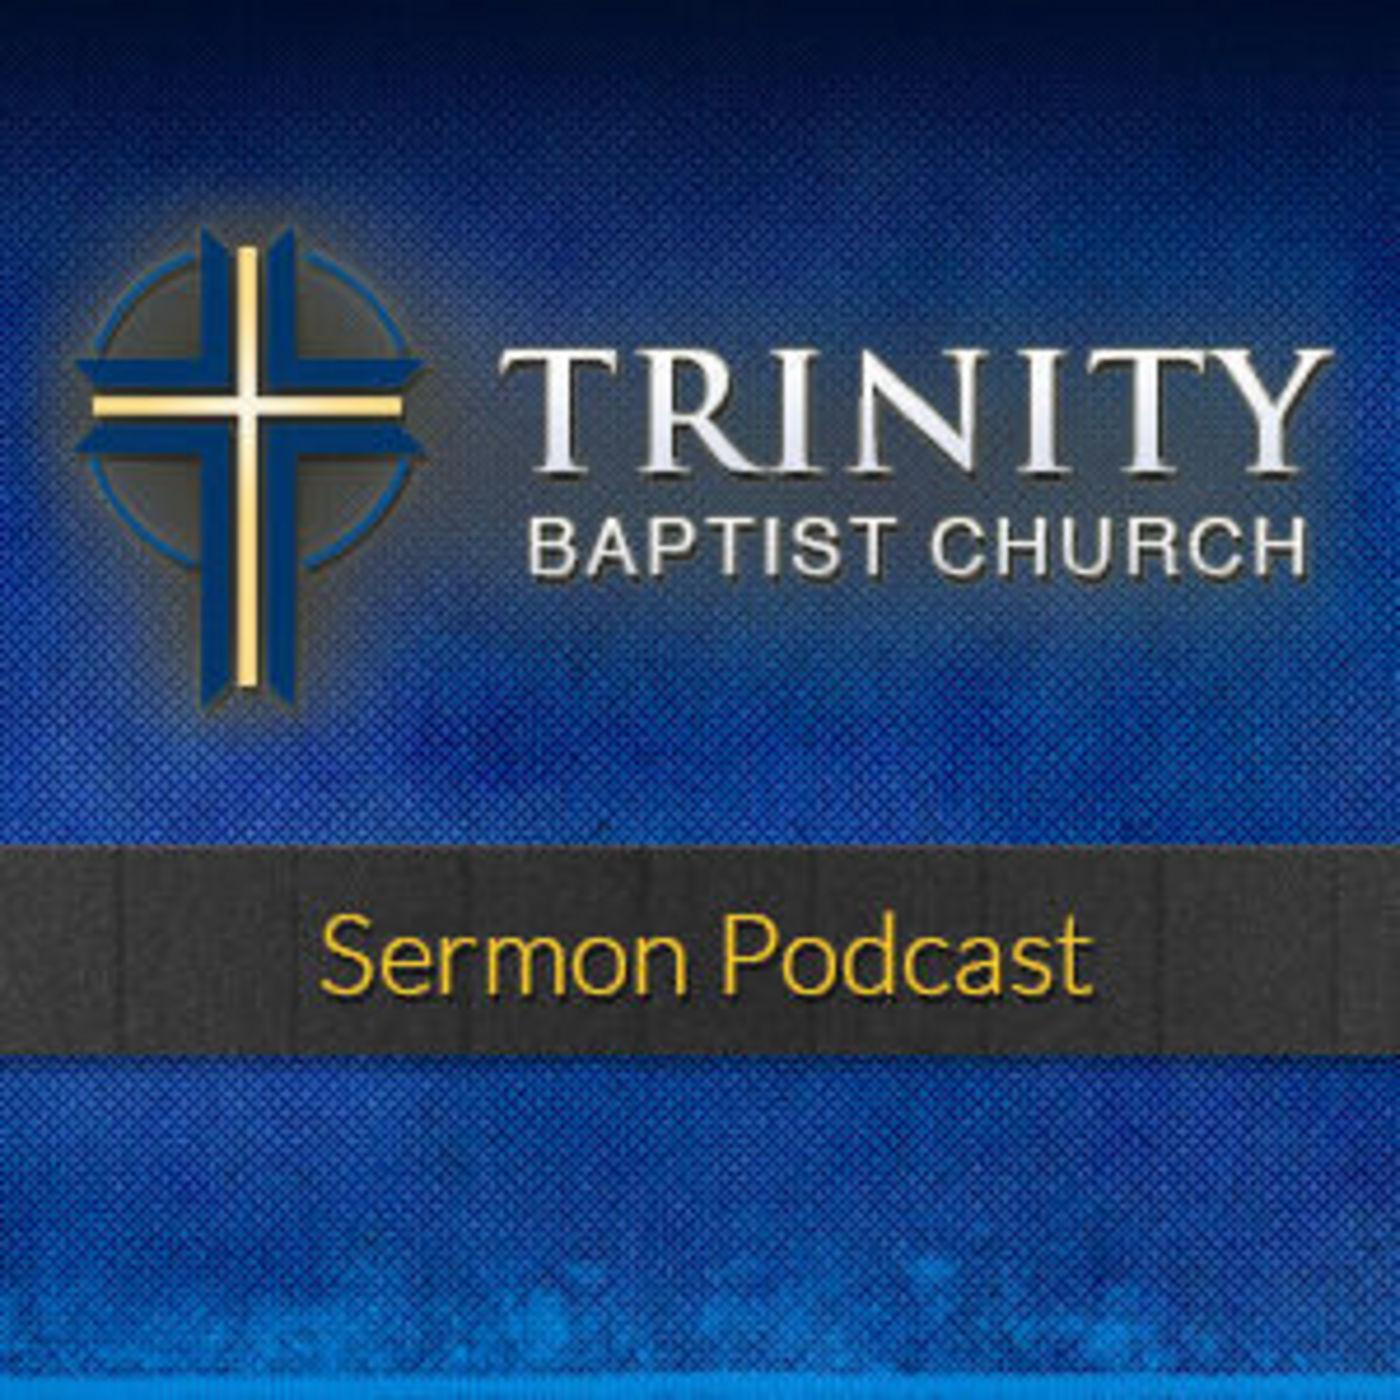 <![CDATA[Trinity Baptist Church - Katy, TX]]>